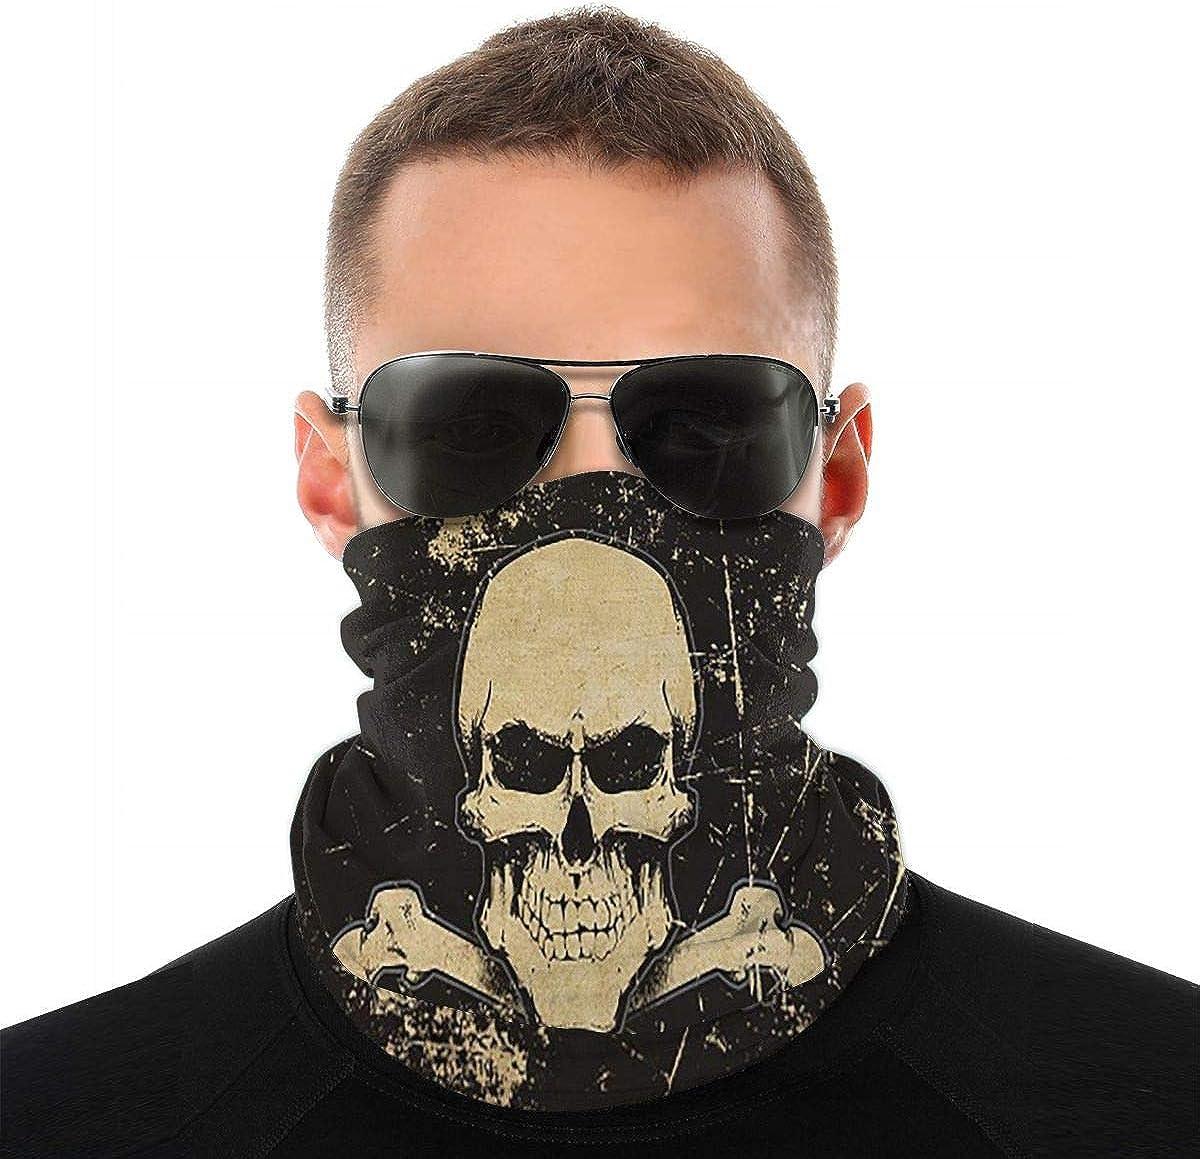 KiuLoam Retro Black Skull Seamless Face Mask Bandanas Neck Gaiter for Men and Women, Multifunction Headband Scarf for Dust, Outdoors, Sports